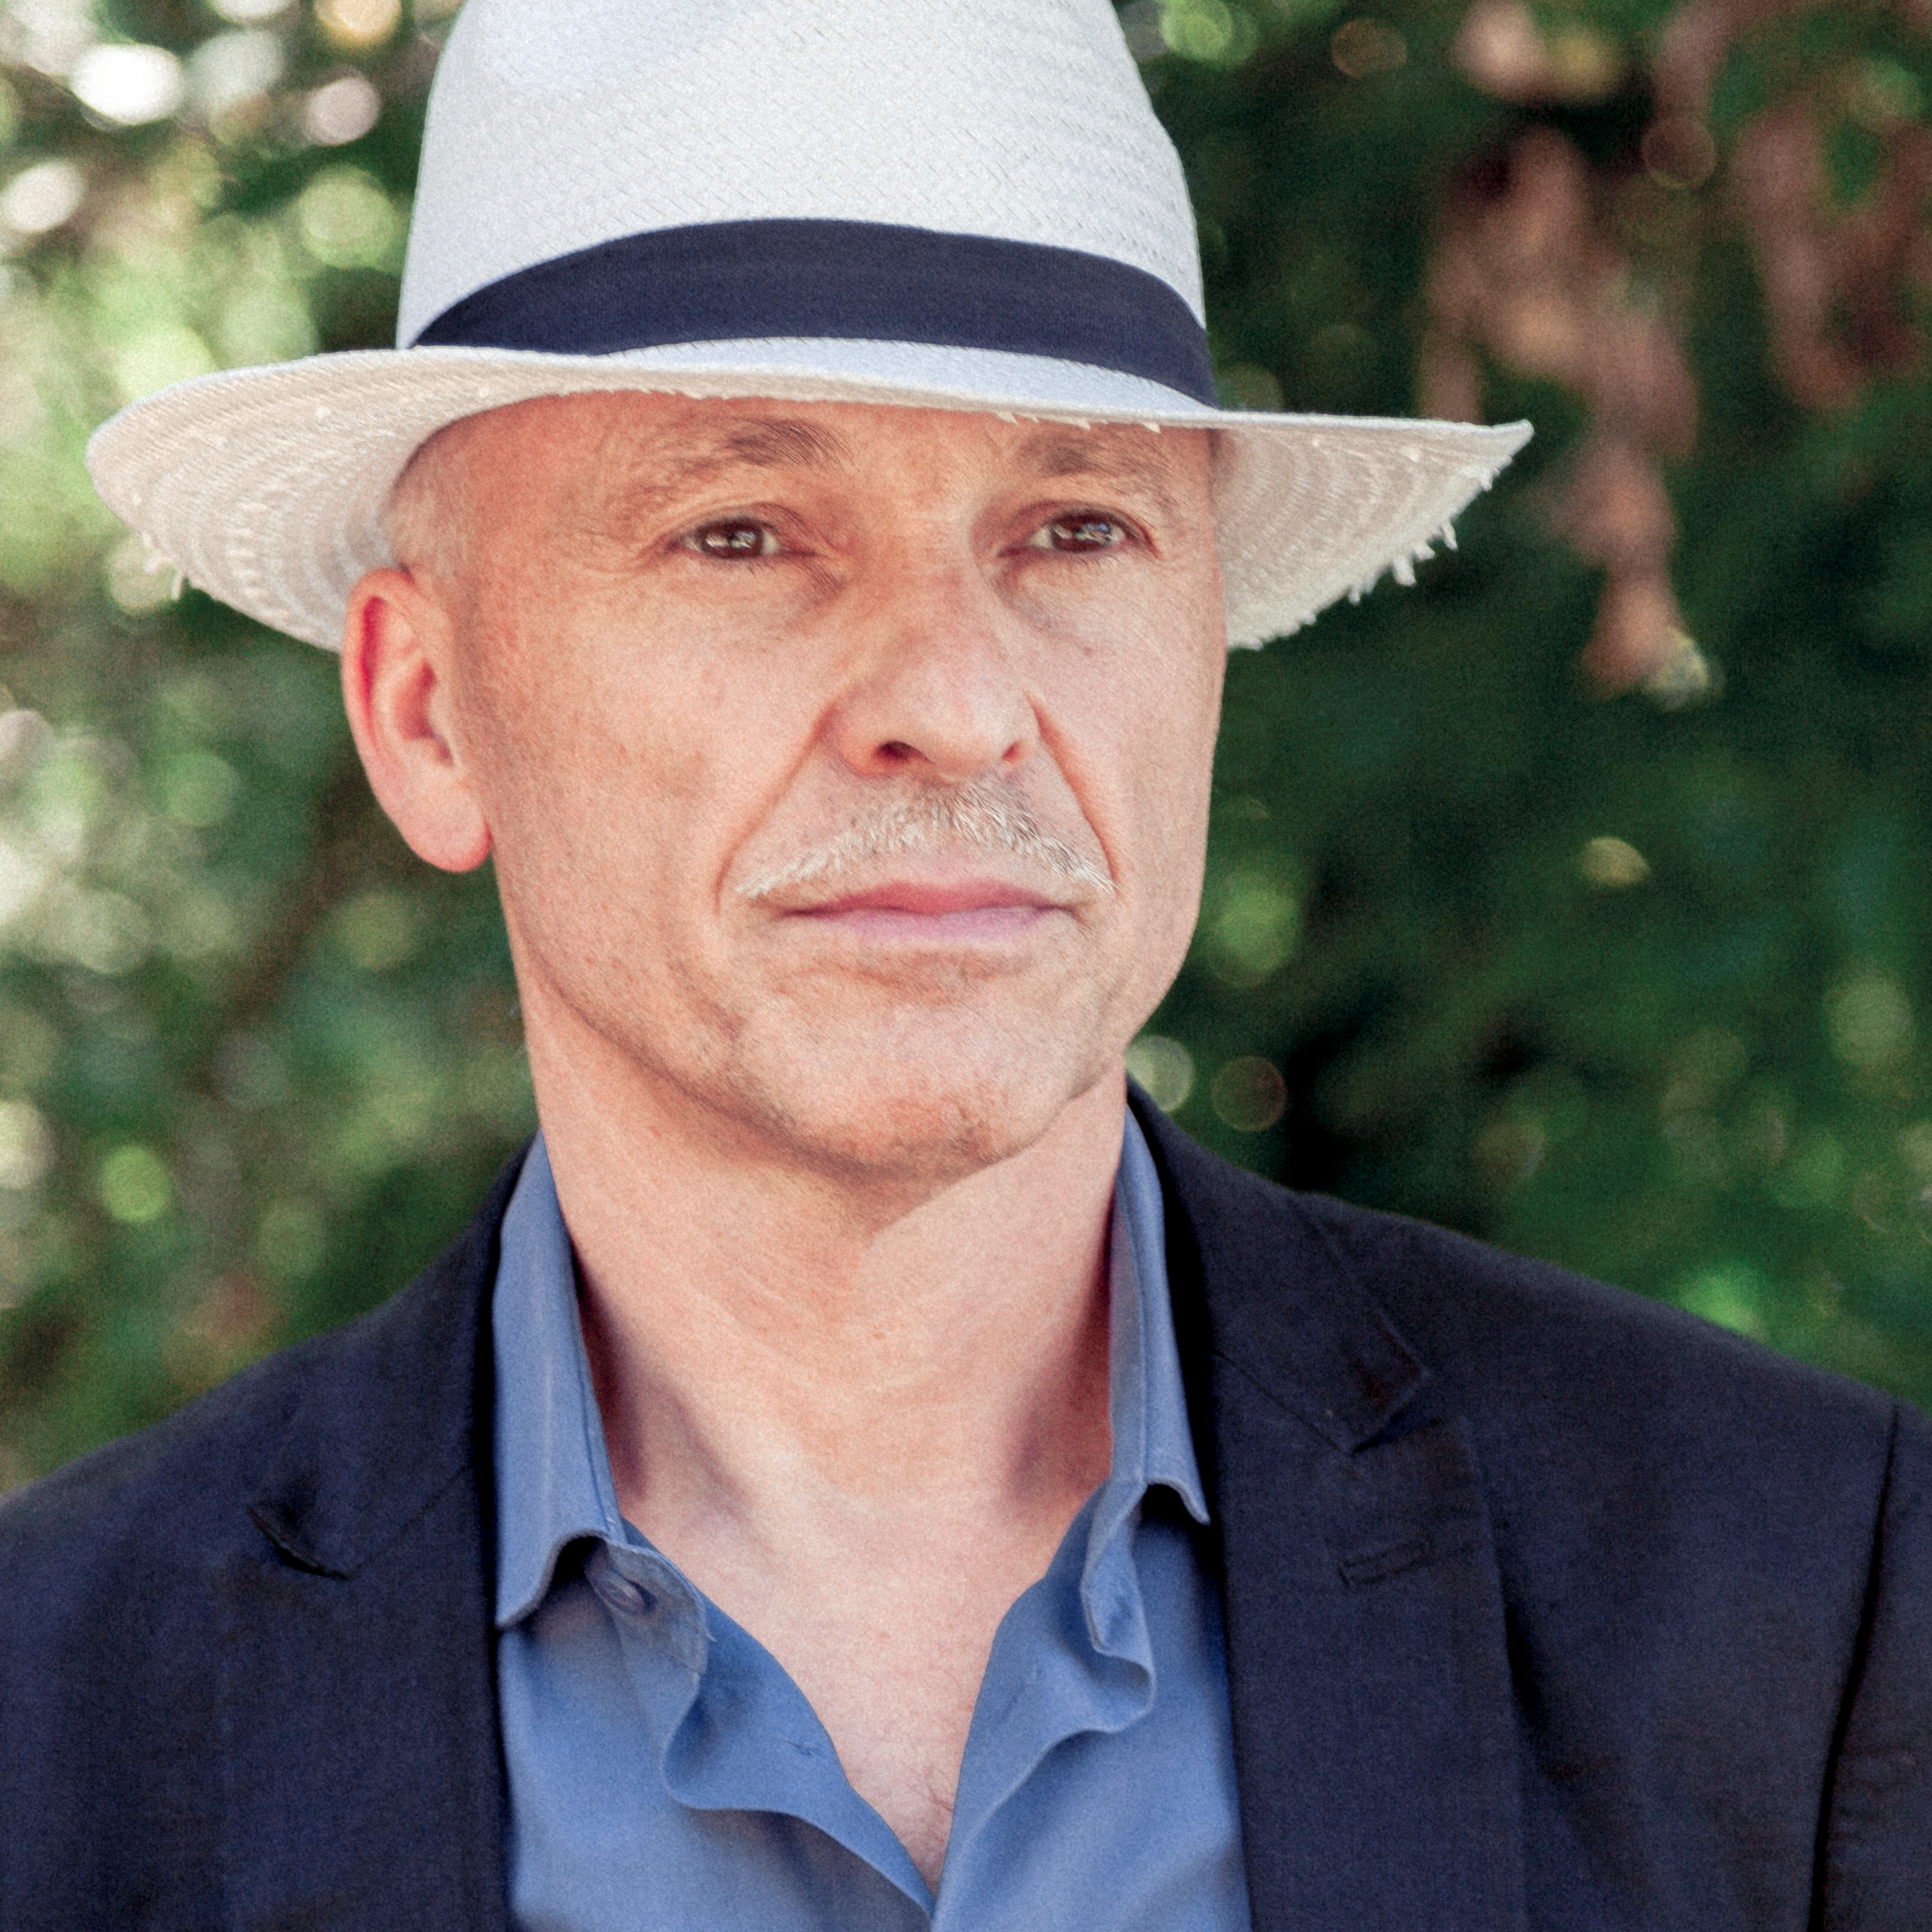 Patrick Burgan